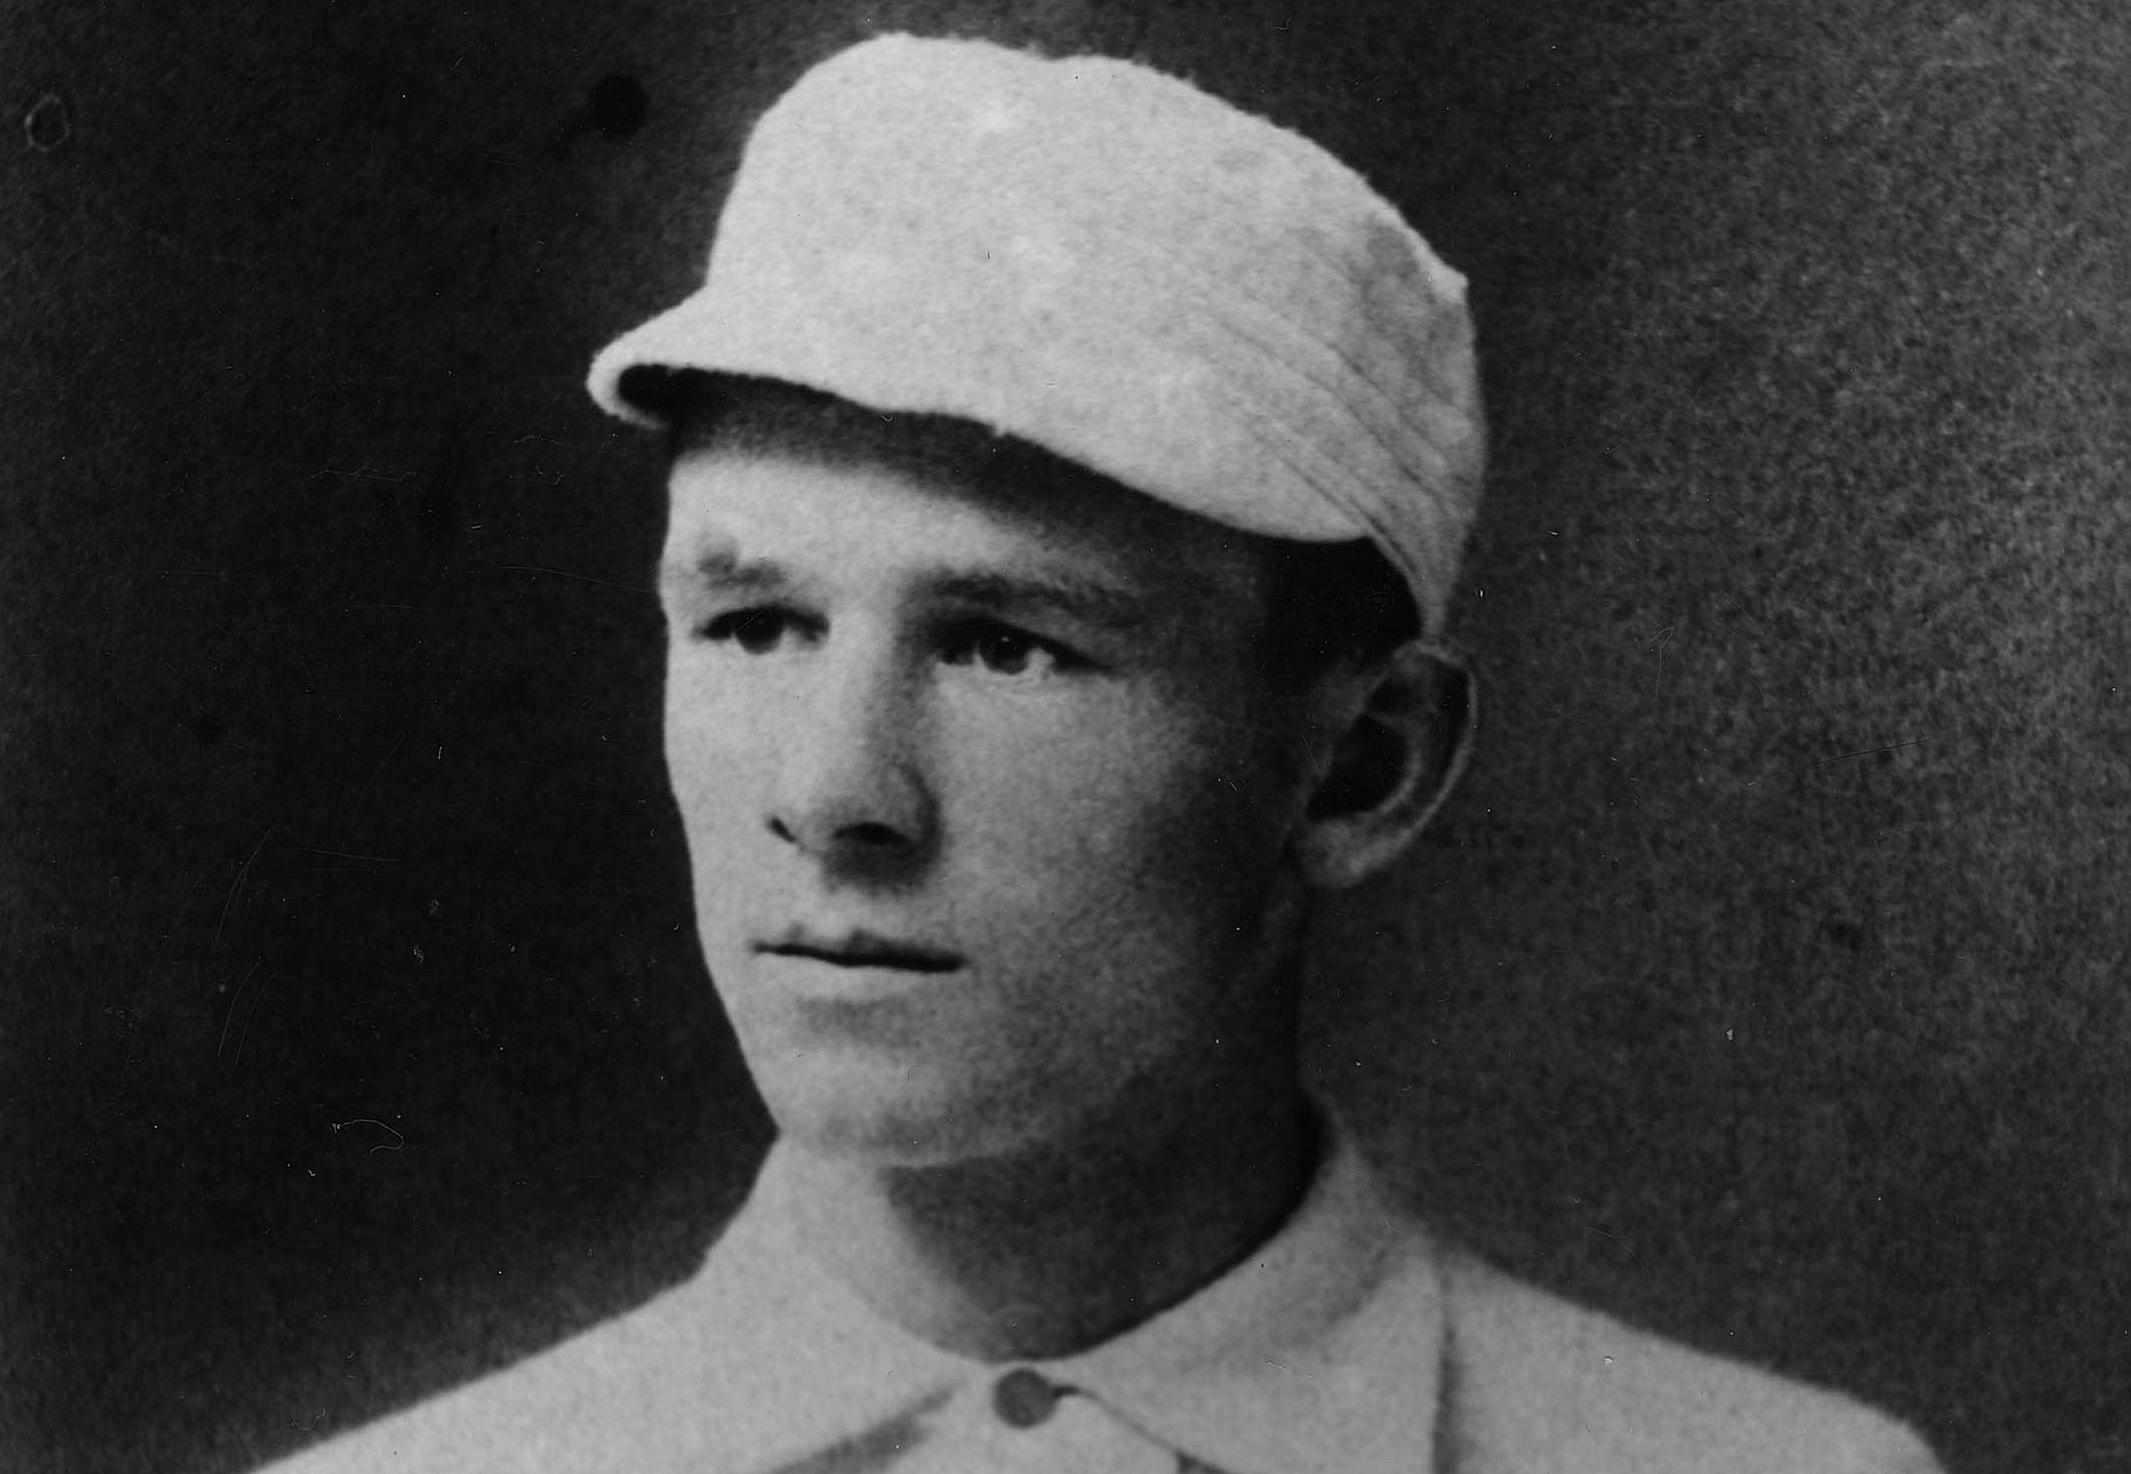 Photograph of baseball legend John McGraw